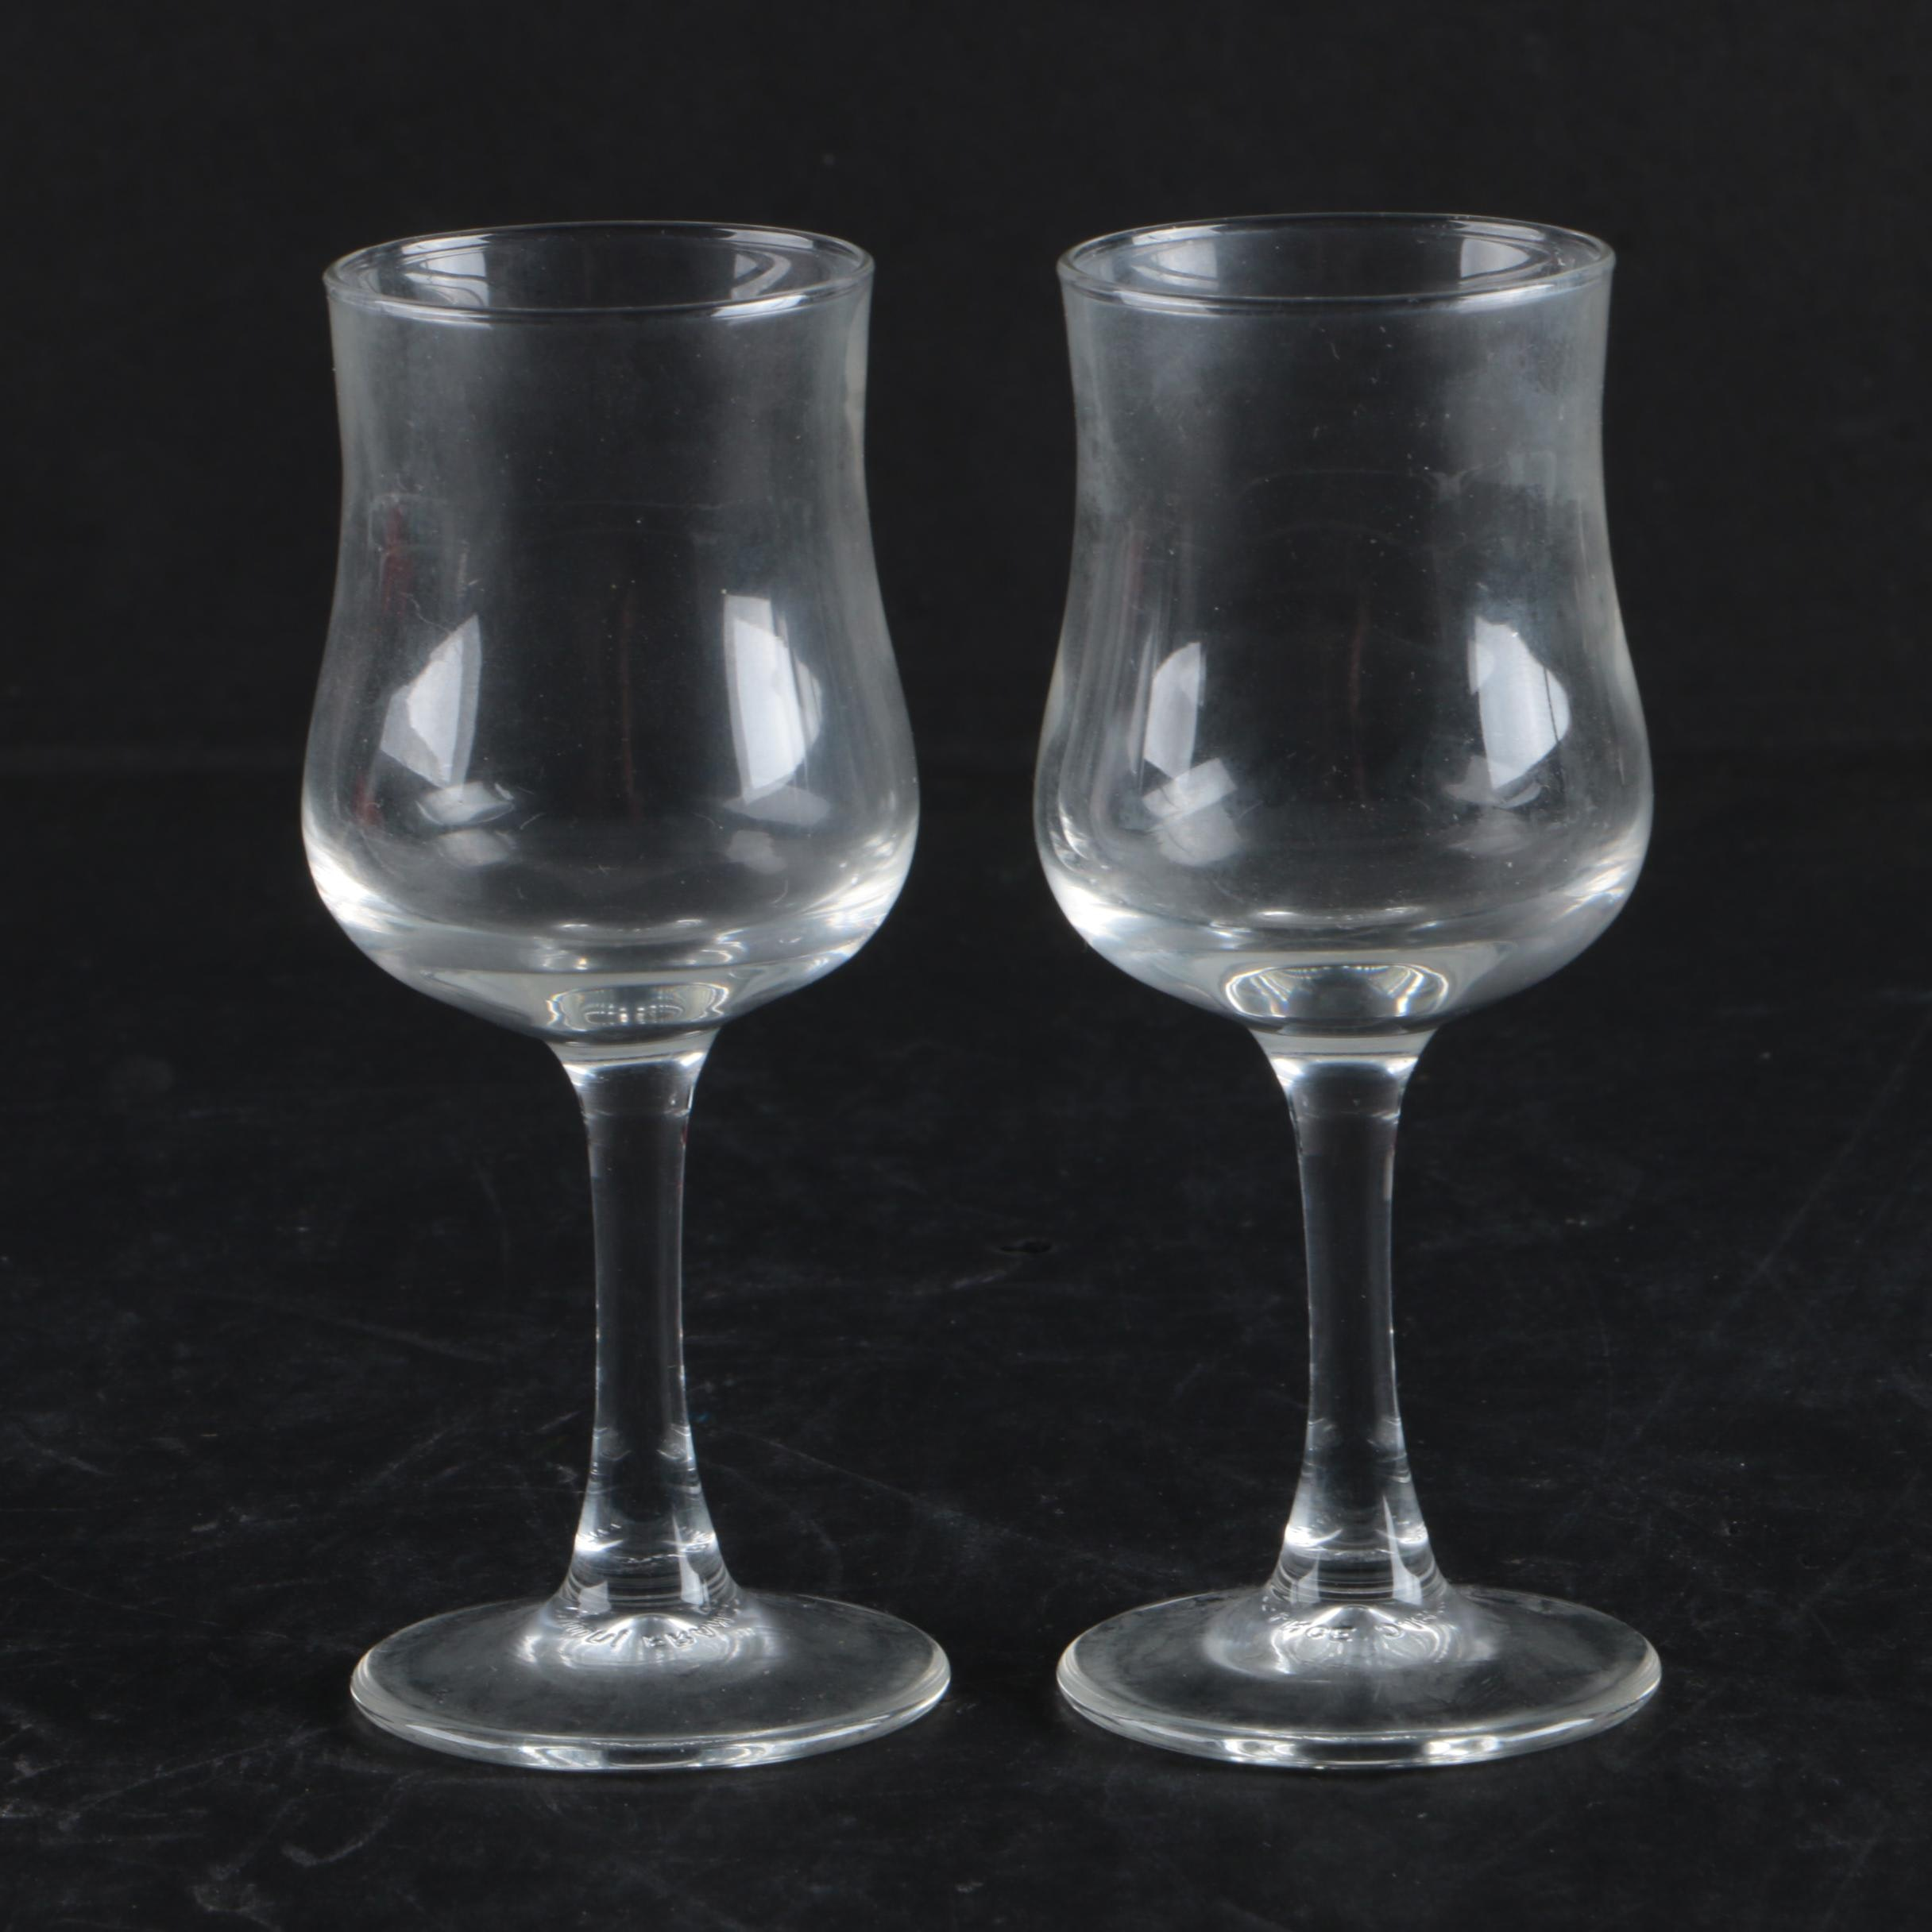 Luminarc Clear Cordial Glasses